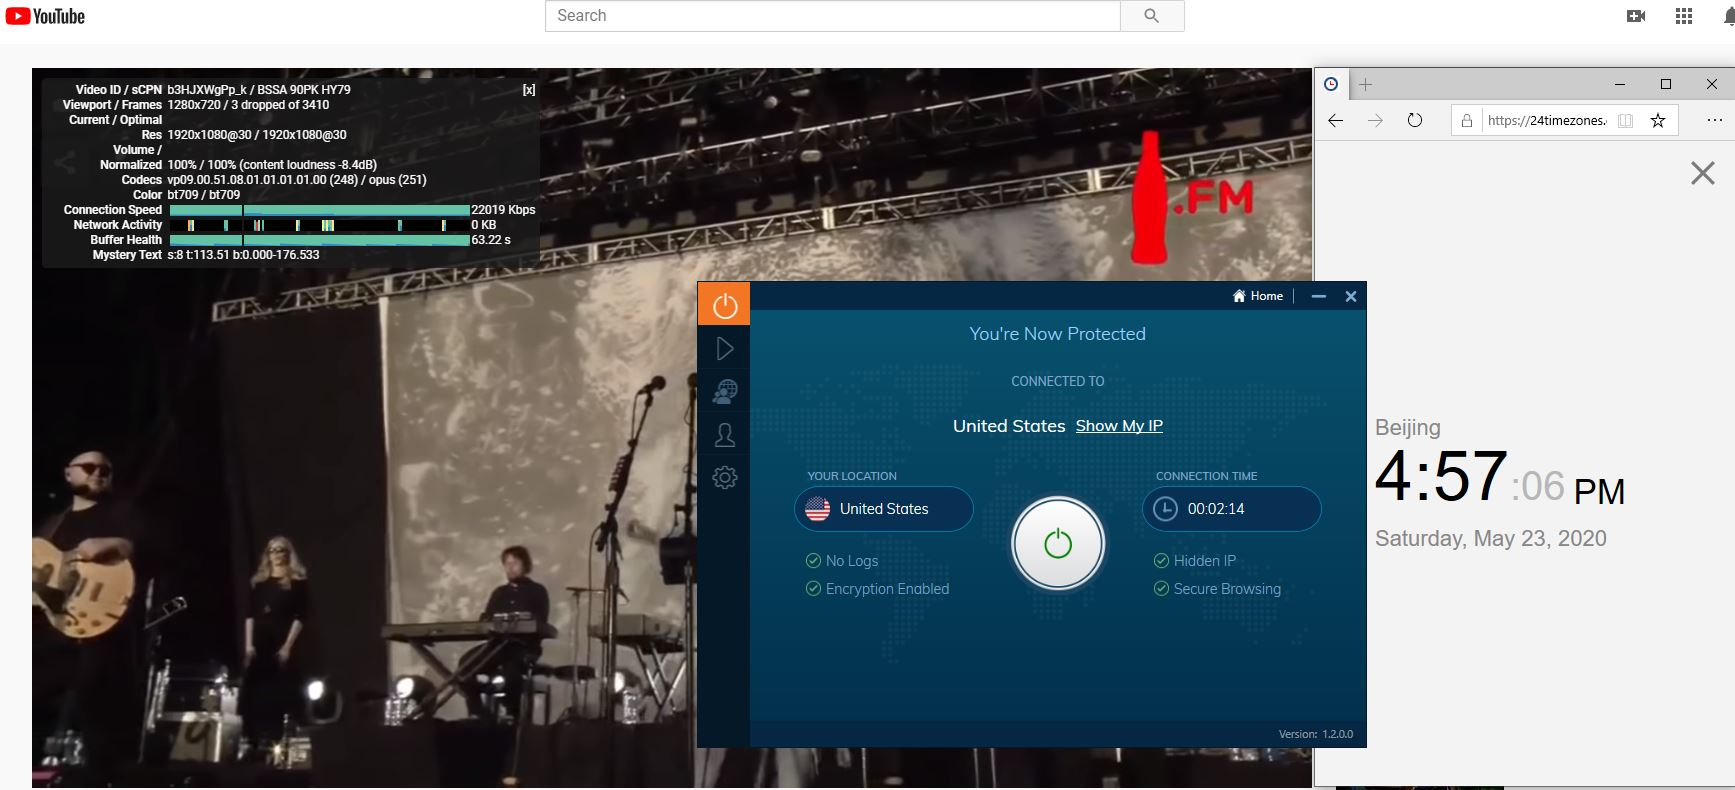 Windows10 IvacyVPN USA 中国VPN 翻墙 科学上网 youtube测速-20200523